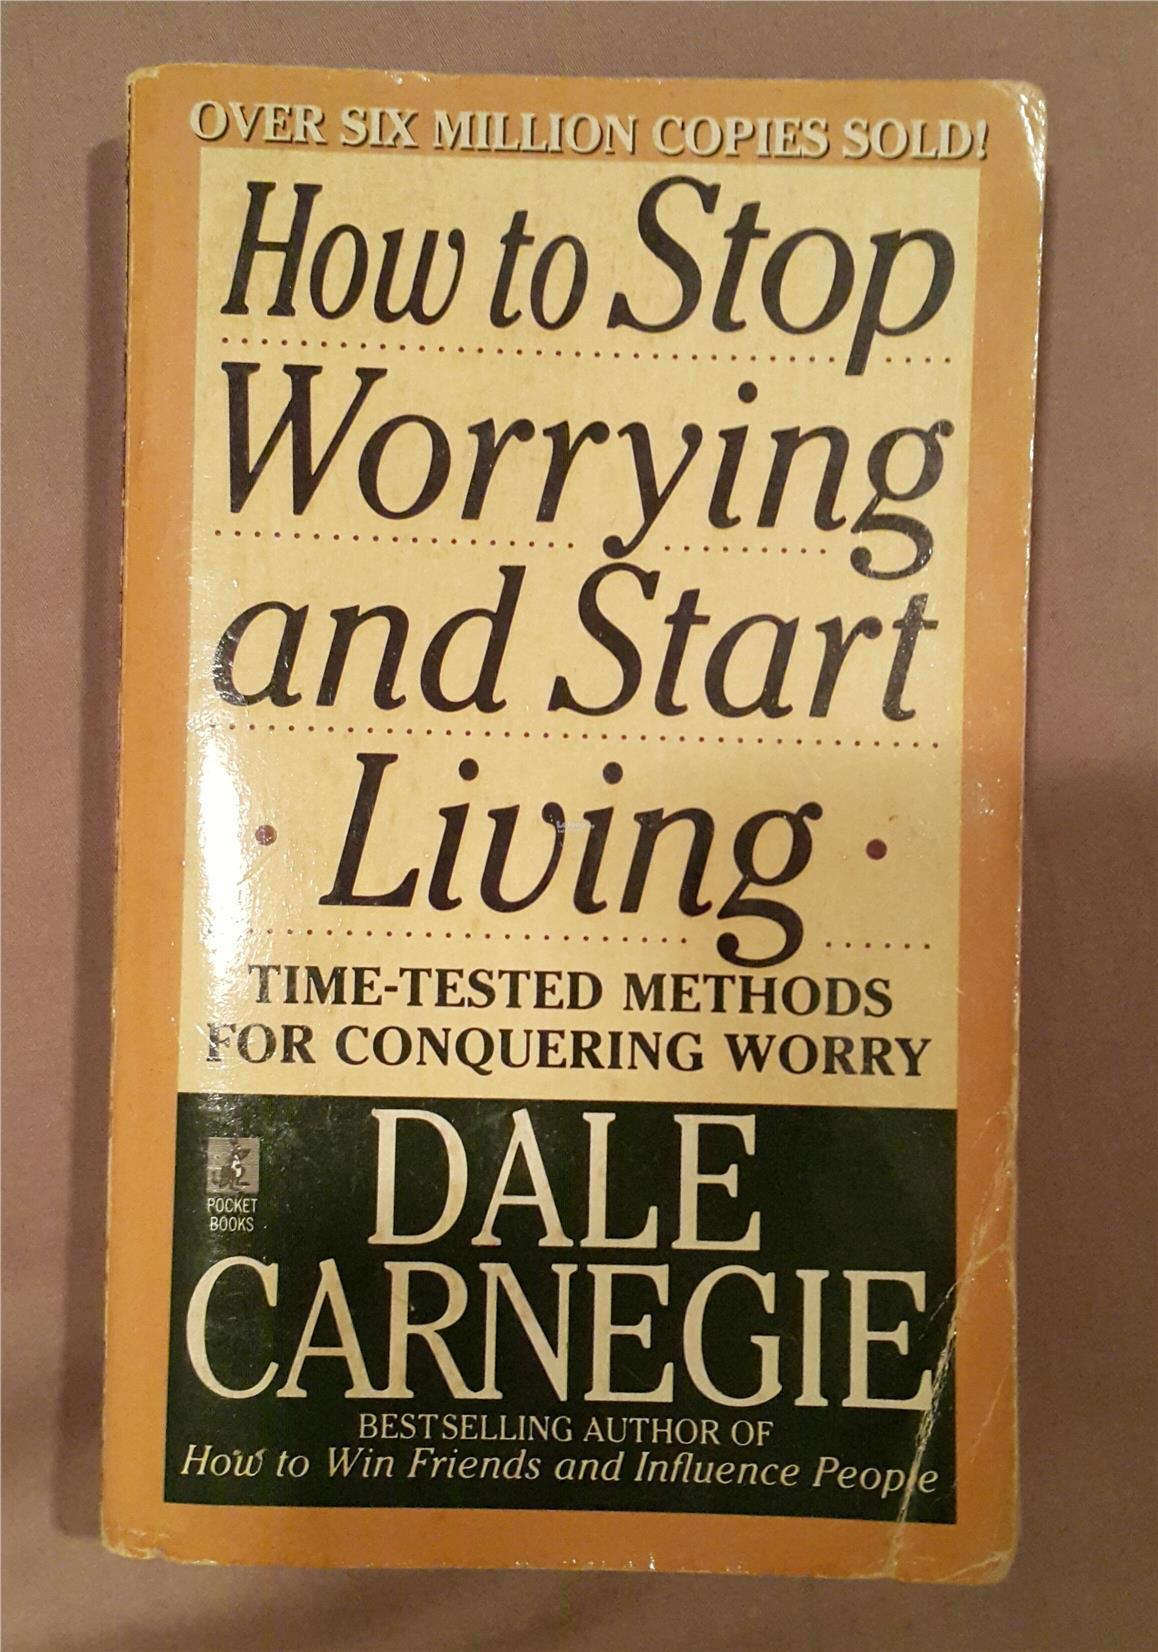 How to start living